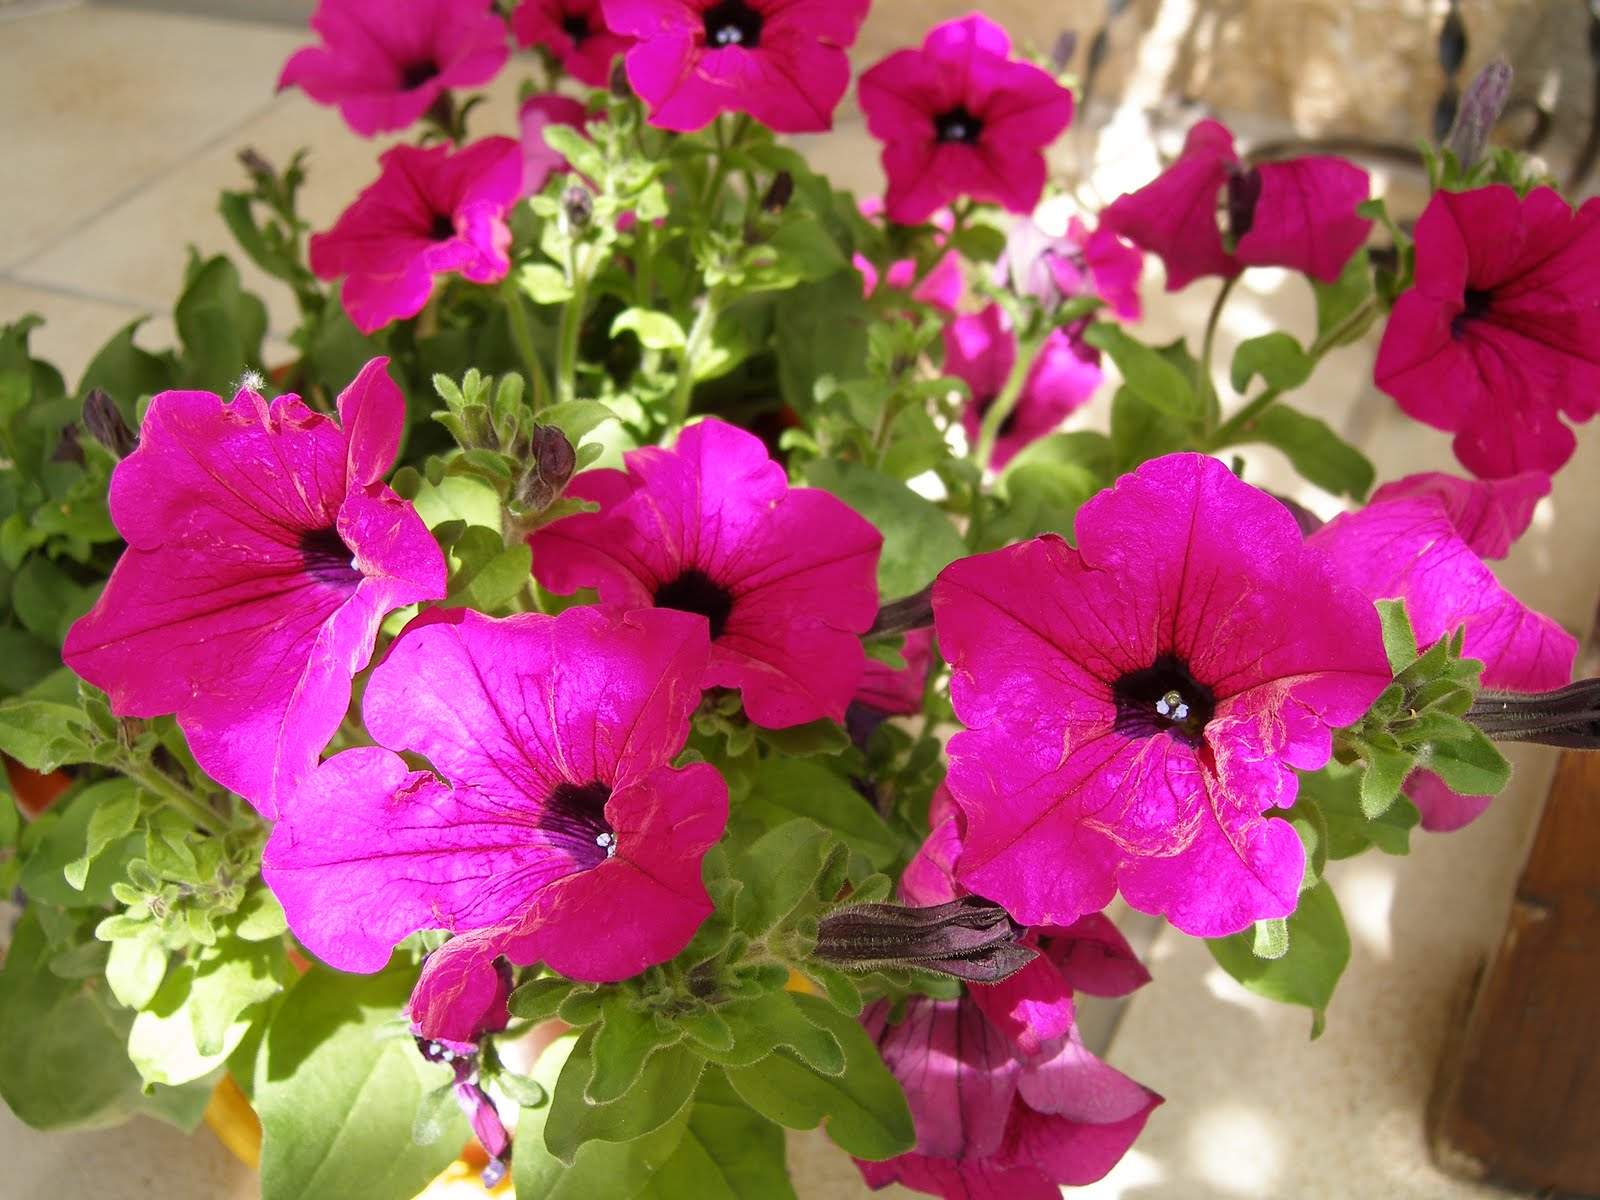 Las Mejores Imagenes Gratis Flores